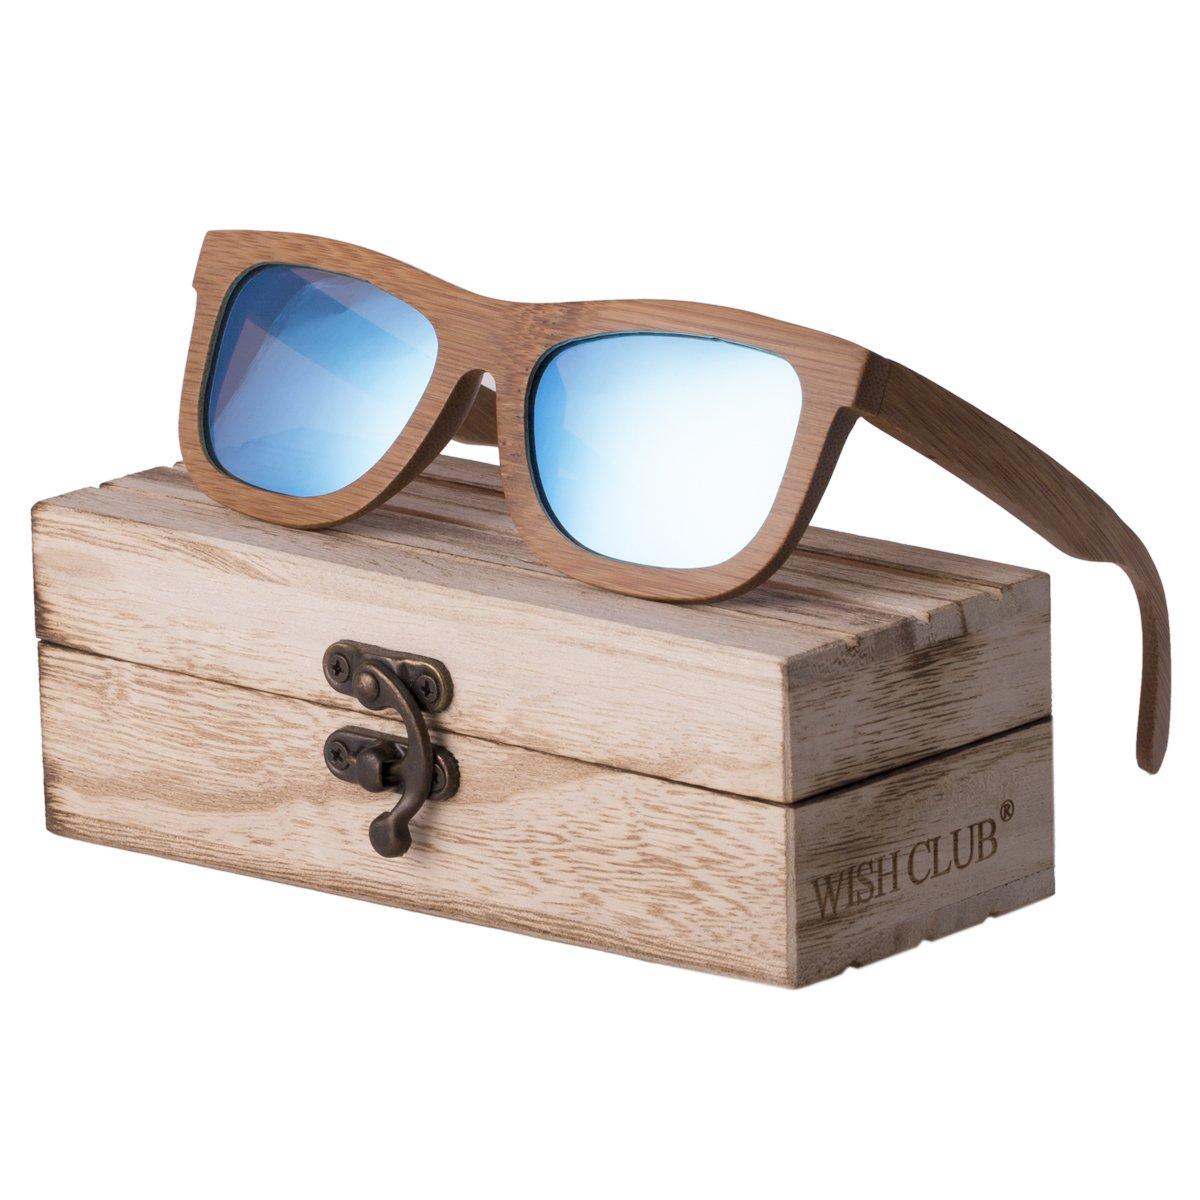 WISH CLUB Bamboo Wood Frame Lightweight Sunglasses Polarized UV 400 Retro Floating Square Mirrored Lenses Fashion Glasses (Blue)